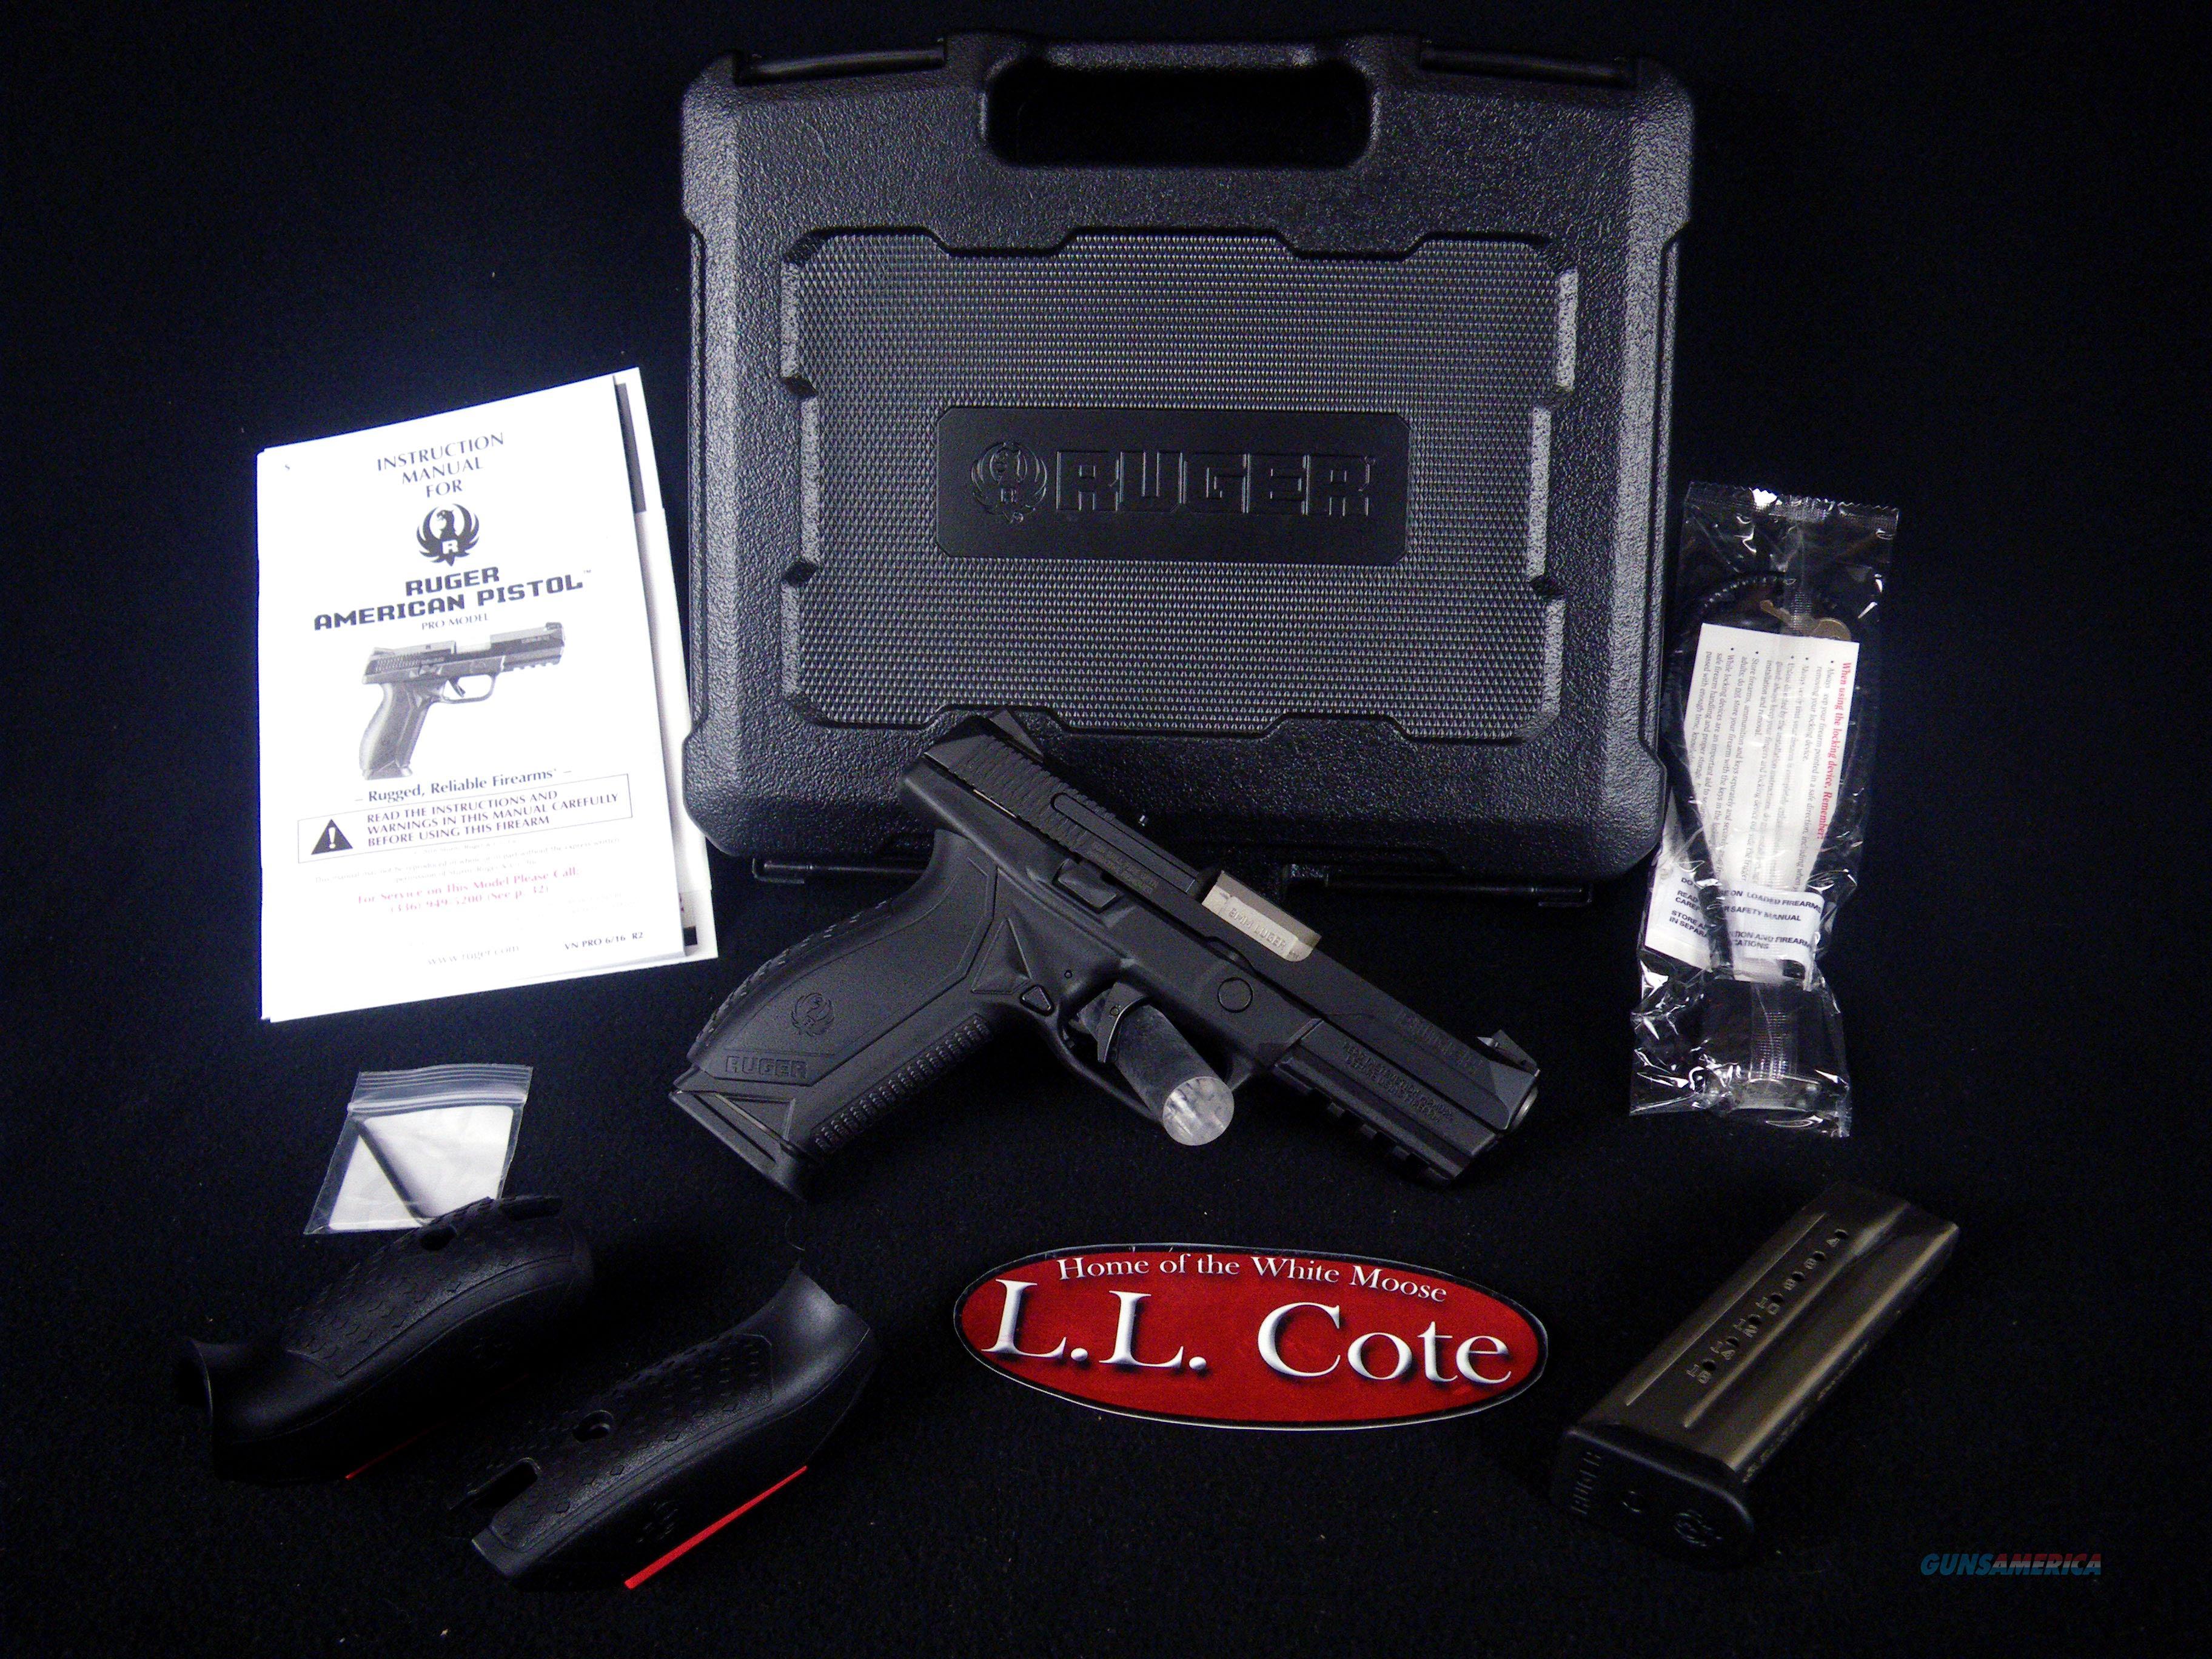 "Ruger American Pistol 9mm 4.2"" Black/Syn NEW 8605  Guns > Pistols > Ruger Semi-Auto Pistols > American Pistol"